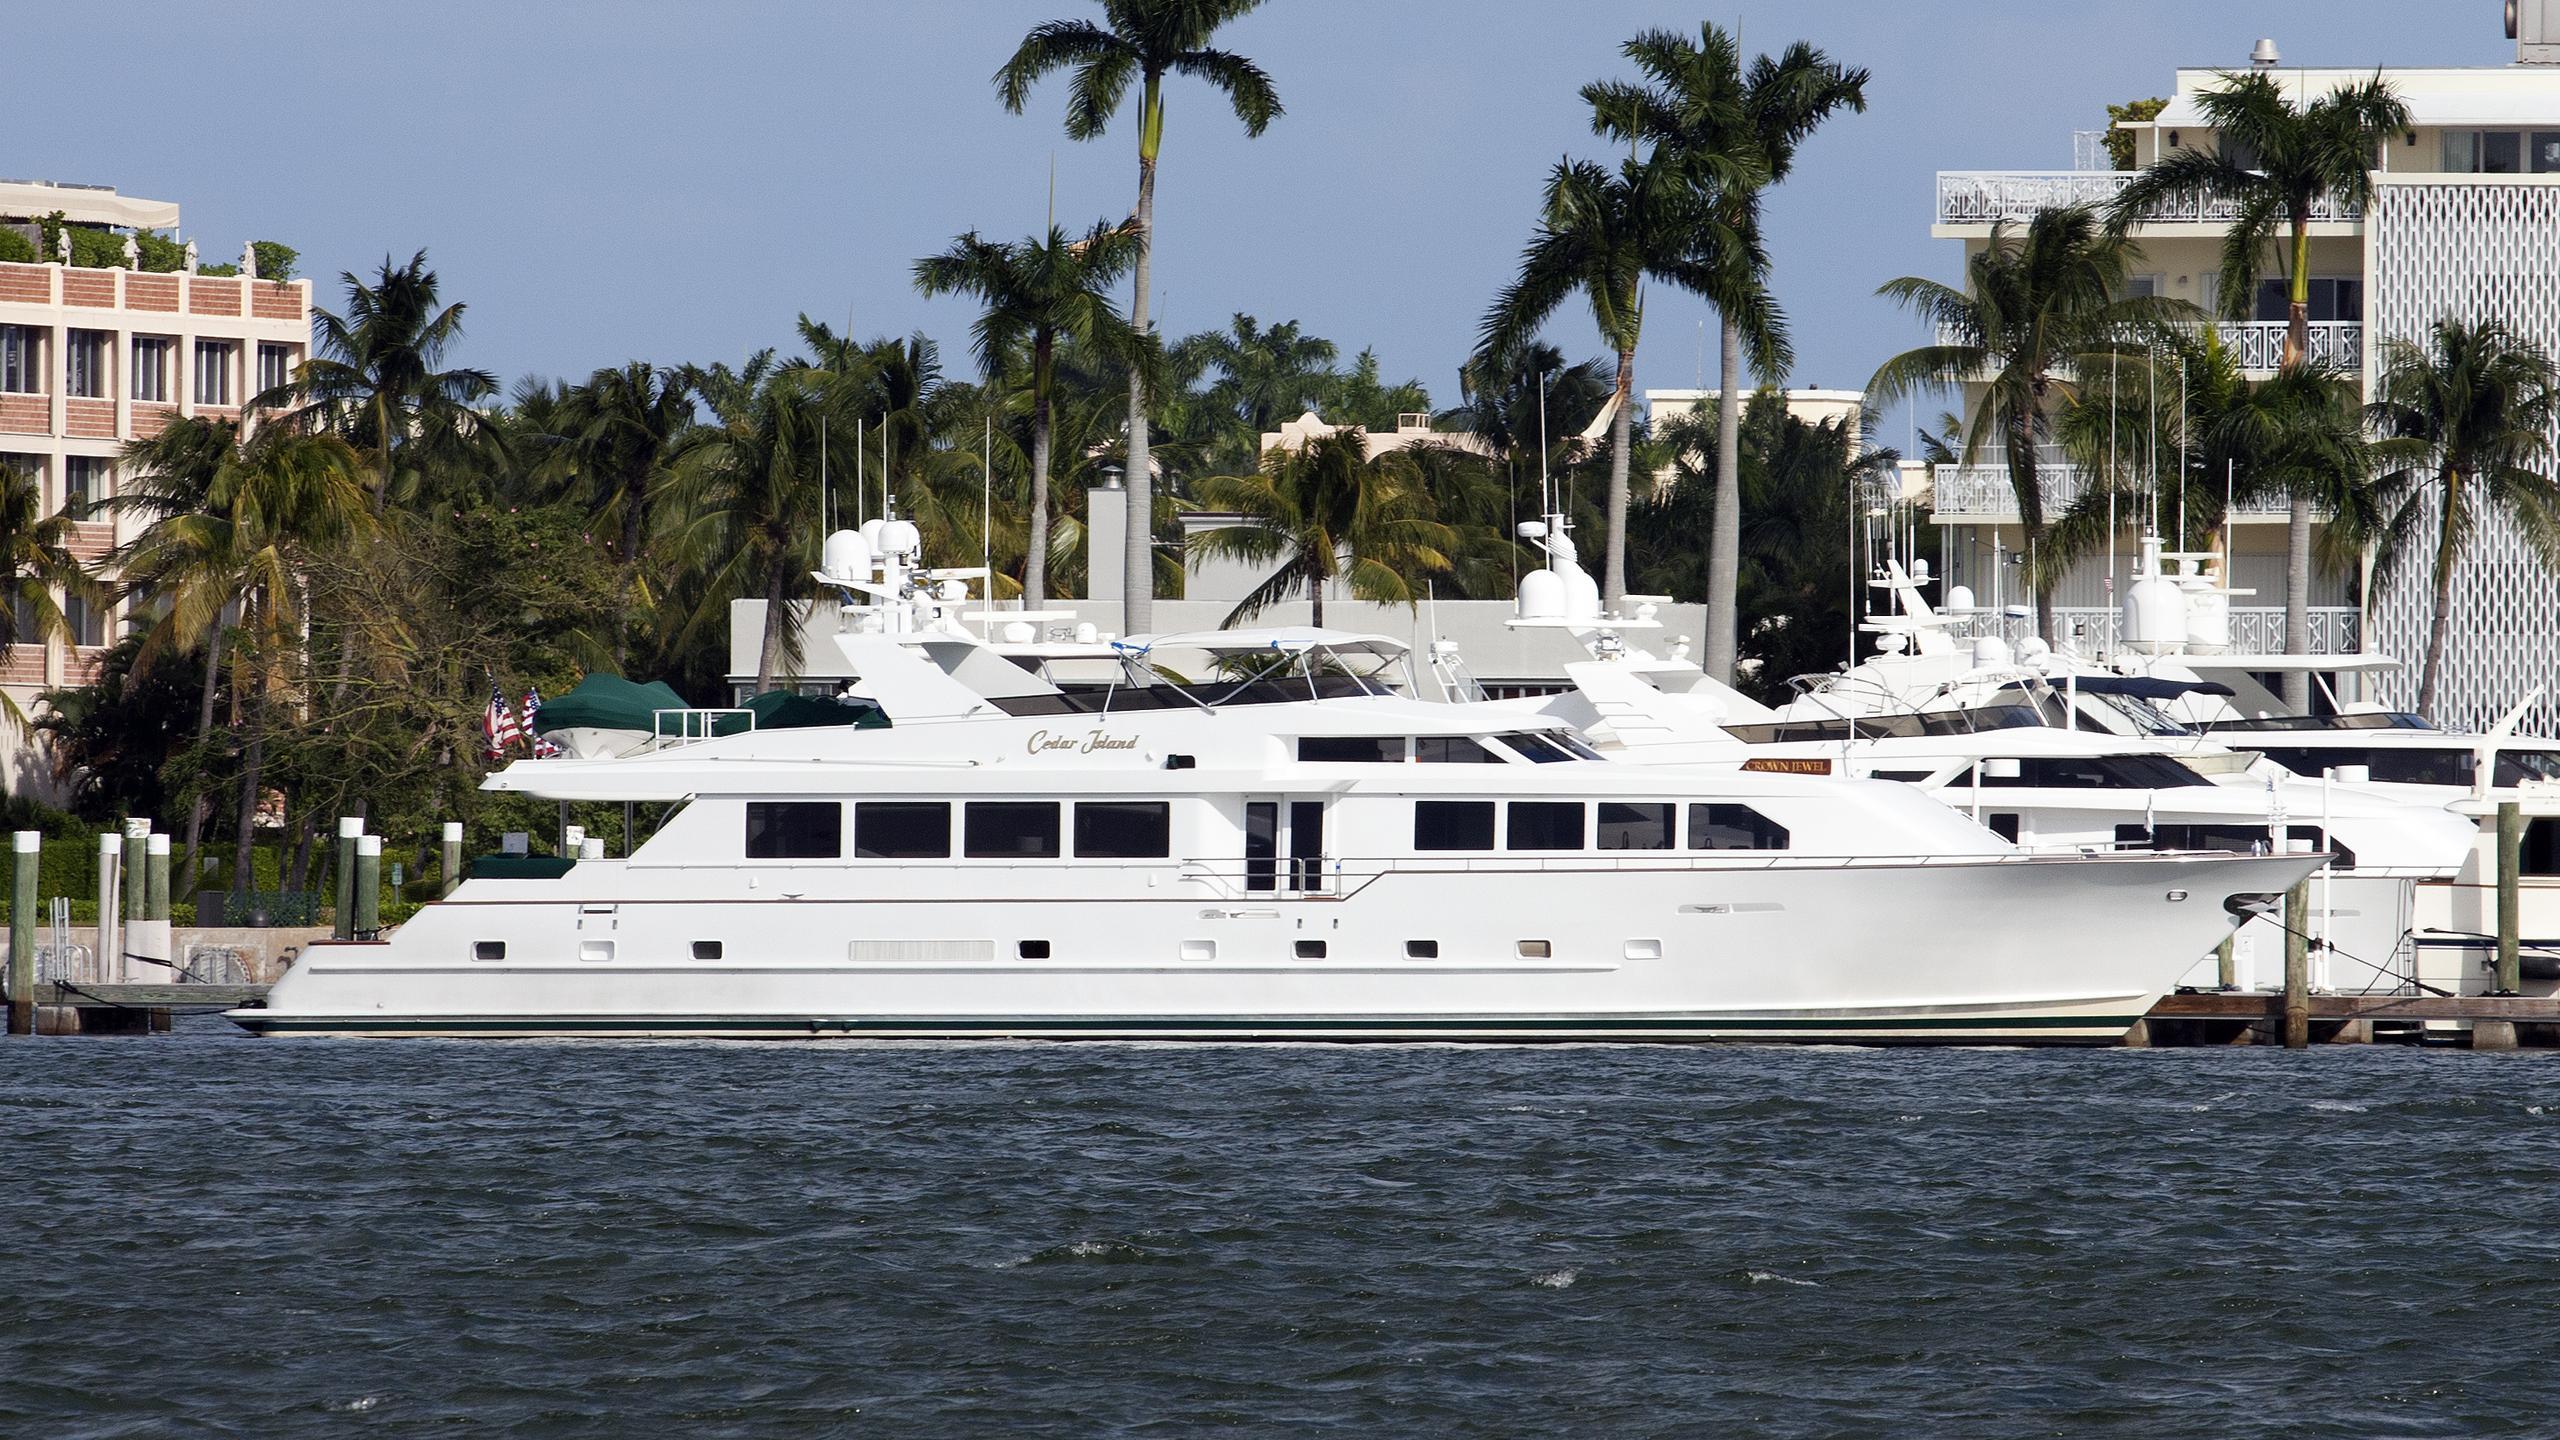 cedar-island-motoryacht-broward-marine-1993-34m-profile